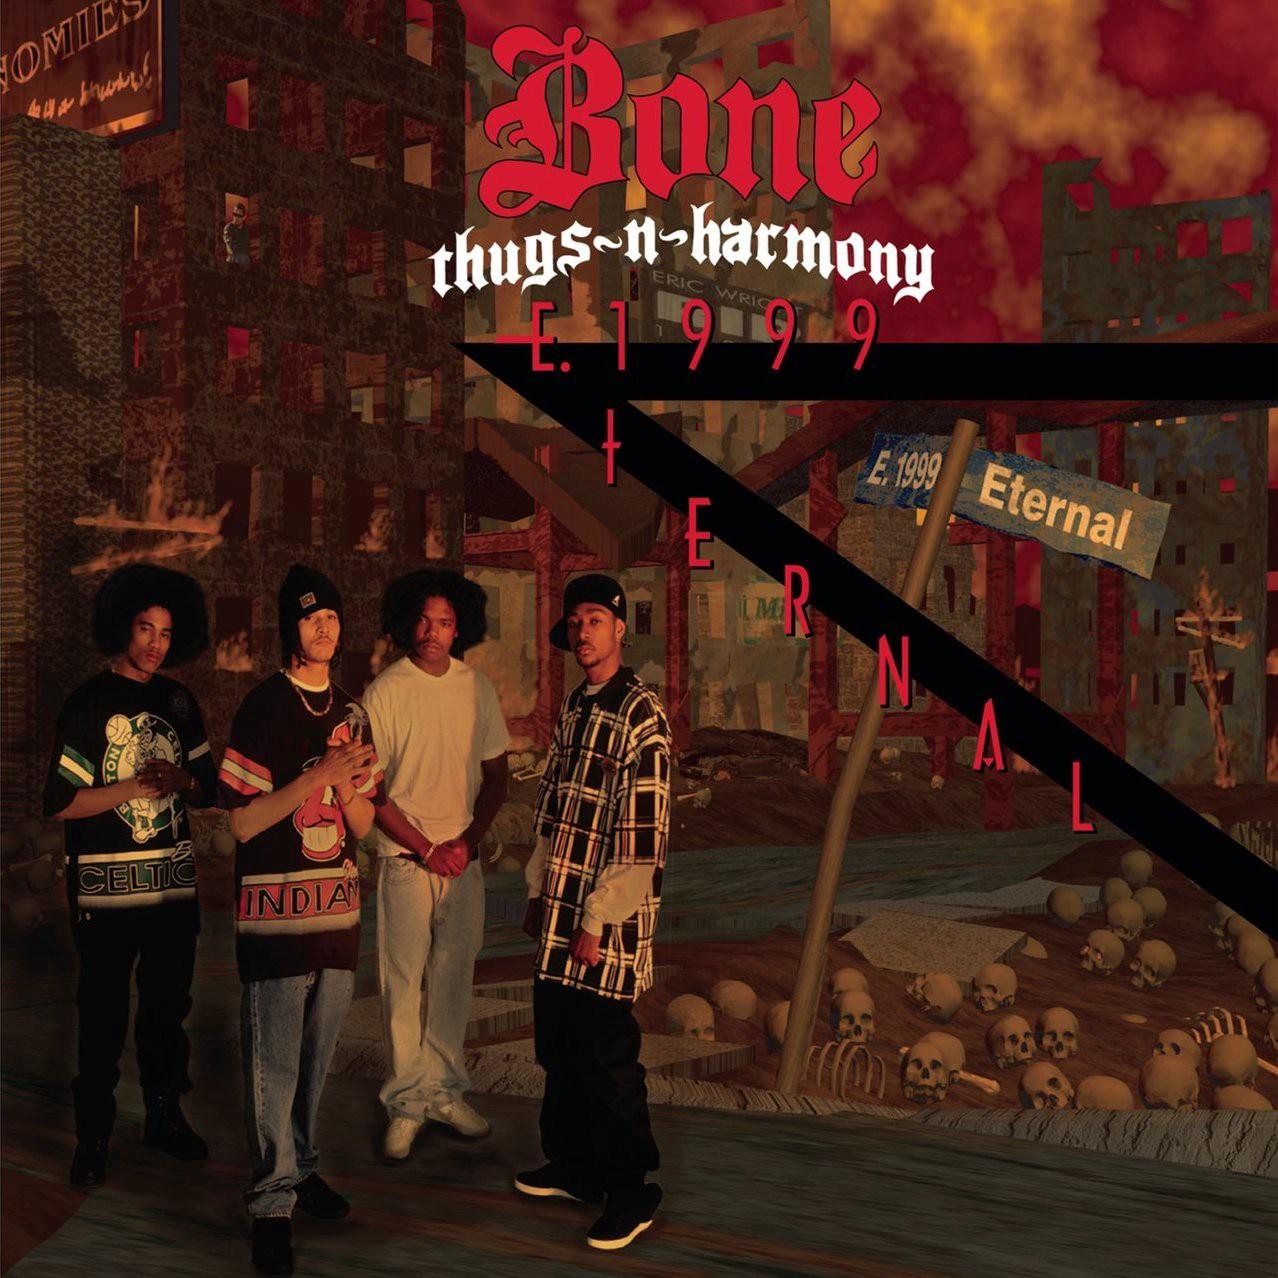 Bone Thugs – E. 1999 Eternal Album Cover